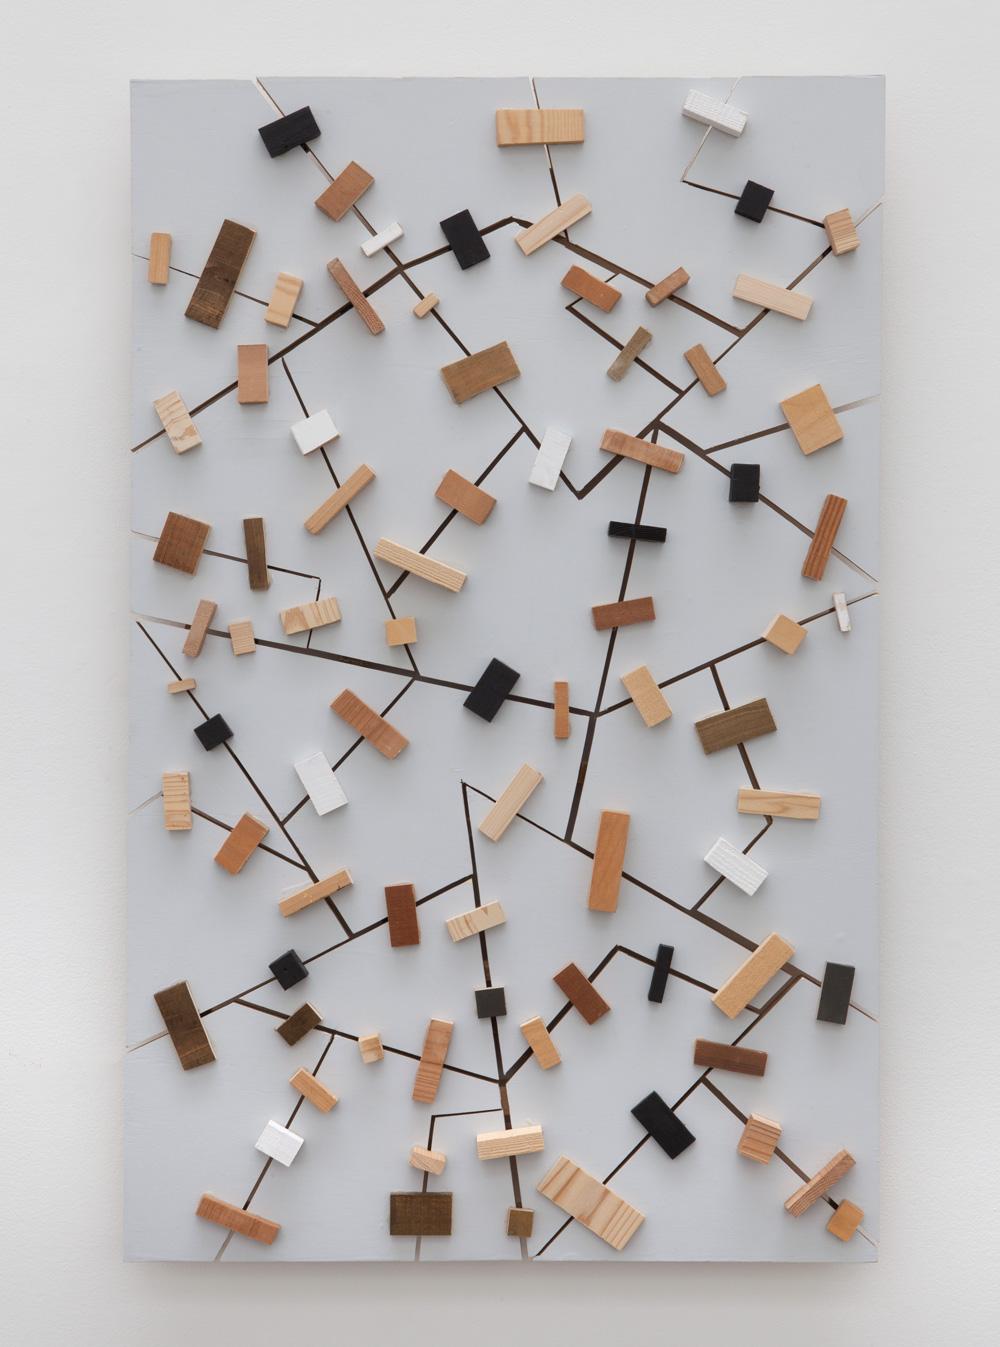 Latent Spatialities , 2016 潜空性 ( Senkūsei ) Wood, paint 49 1/4 x 31 1/2 x 3 3/4 inches 125.1 x 80 x 9.5 centimeters